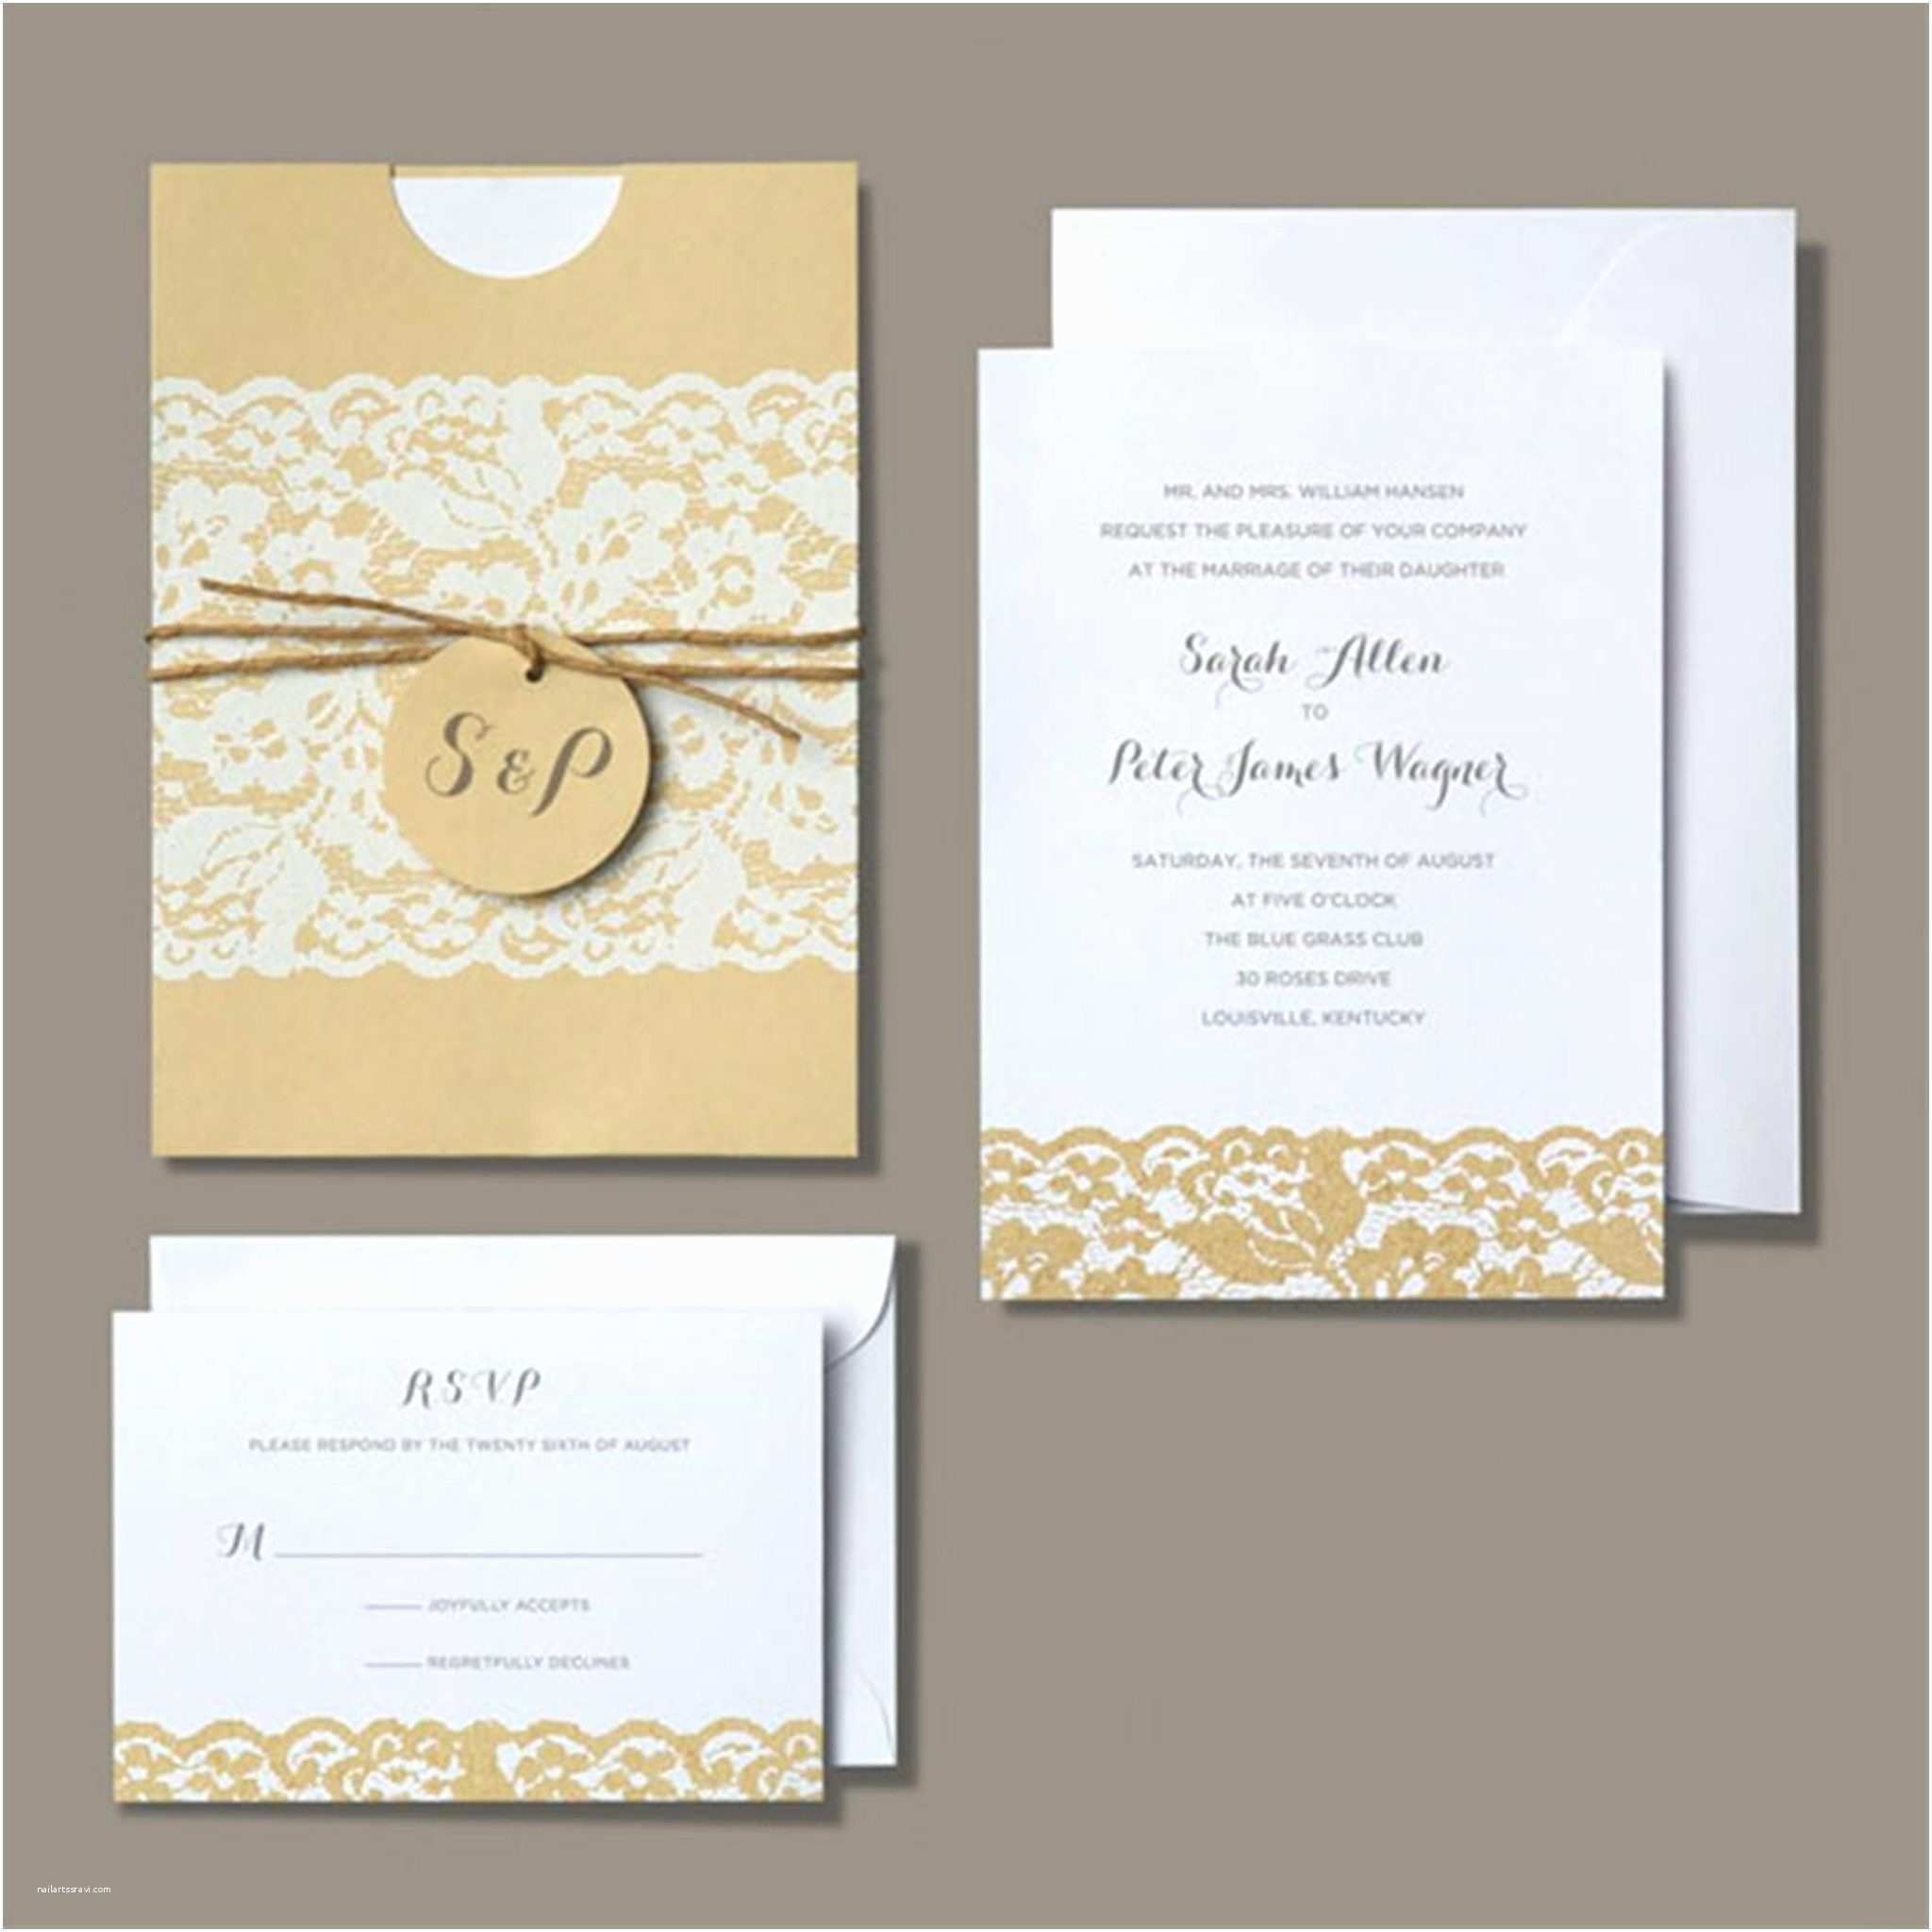 Coed Wedding Shower Invitations Templates Coed Bridal Shower Invitation Wording as Well